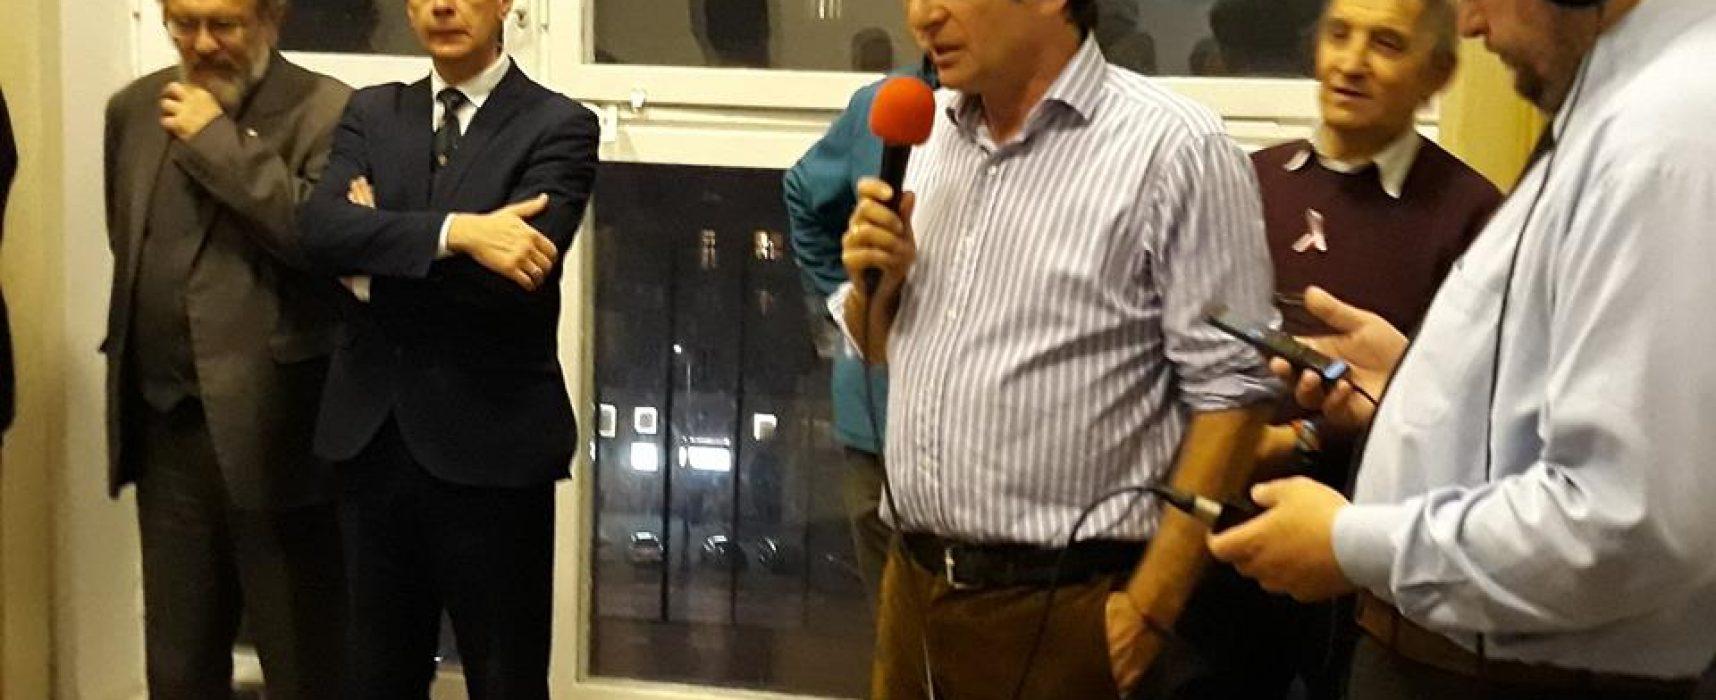 StopFake na antenie Radia Wnet